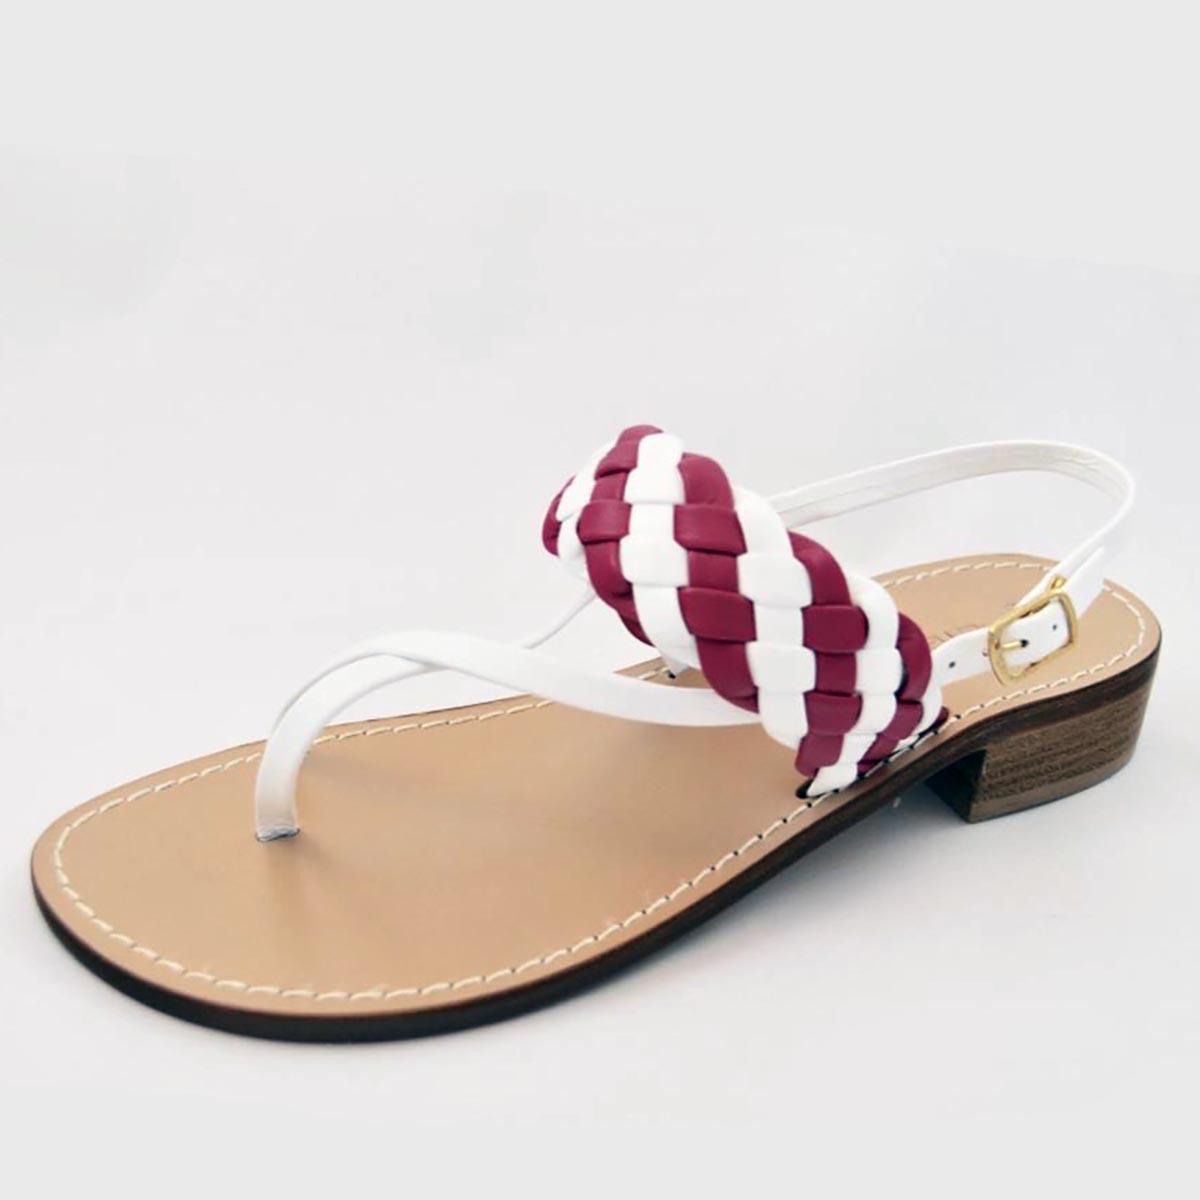 Amanda Jayne - Amalfi Pink Summer Sandal